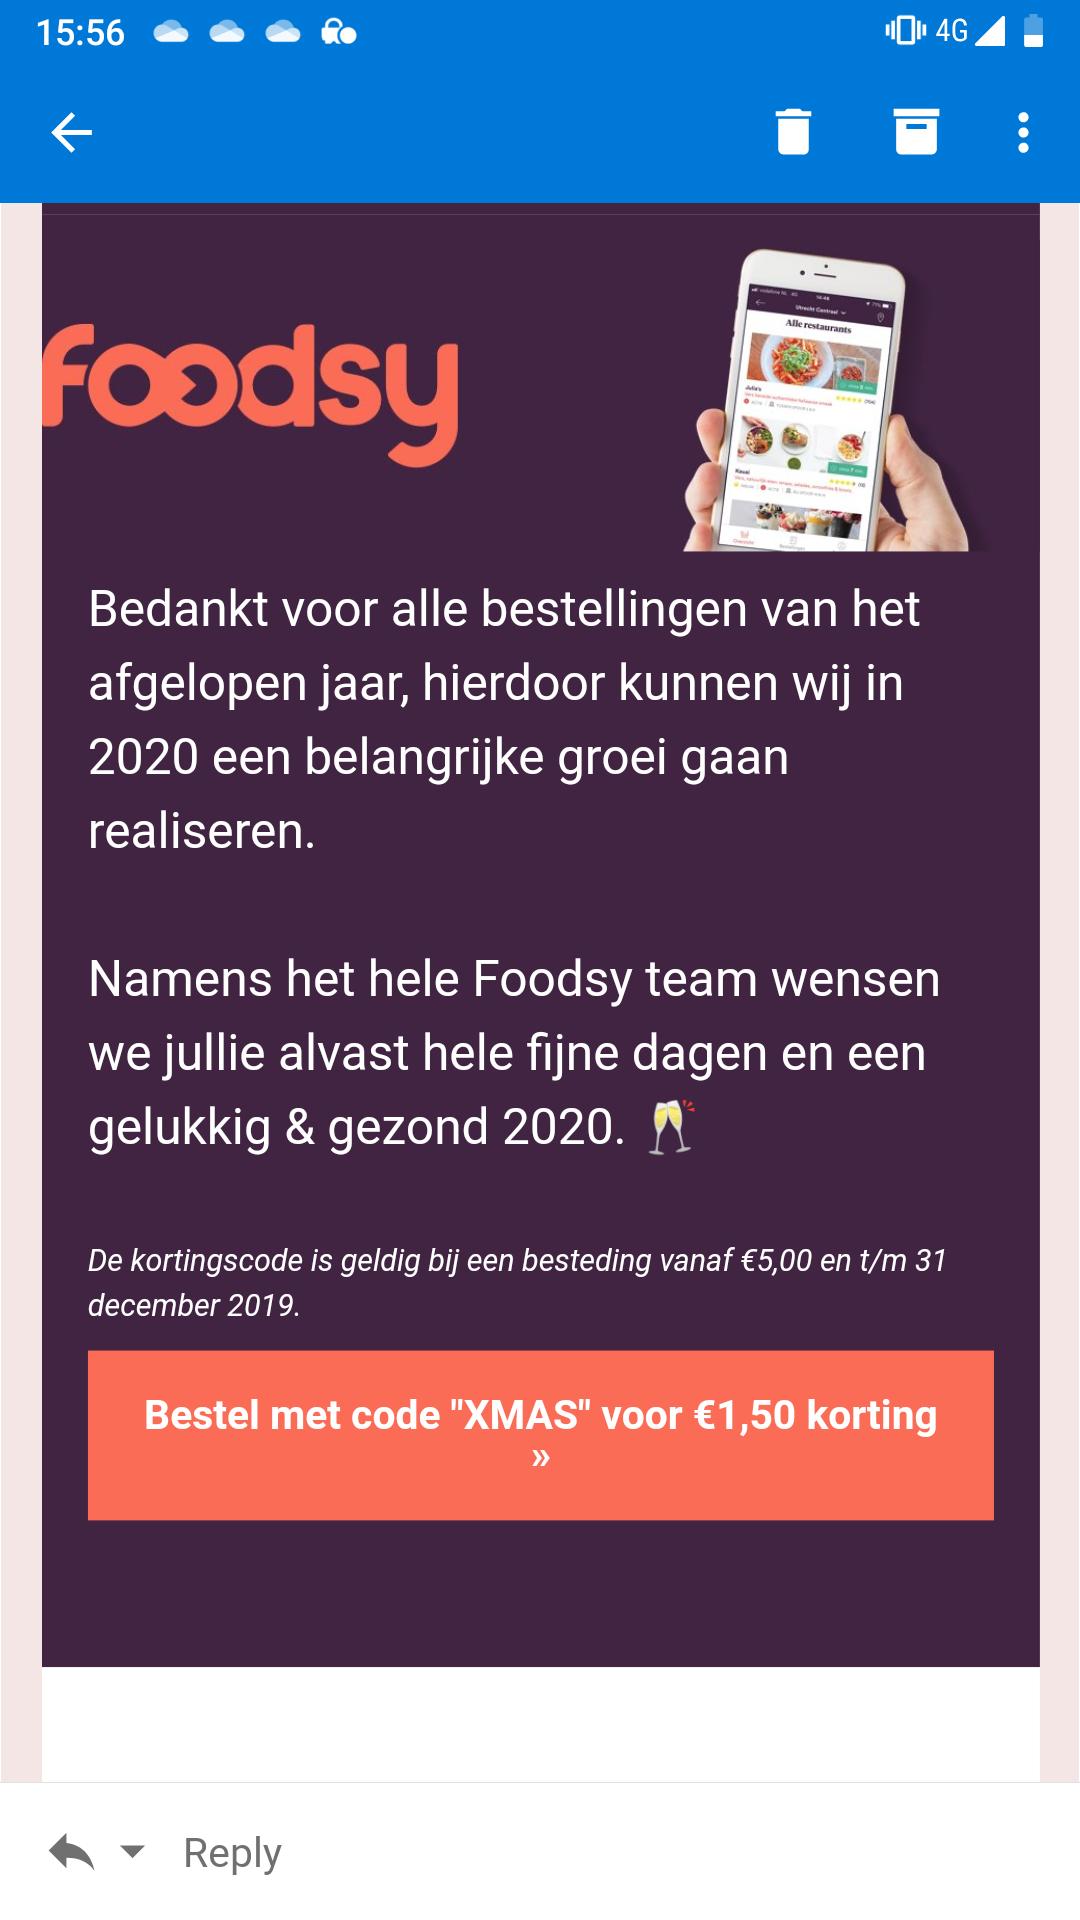 Foodsy - €1,50 korting